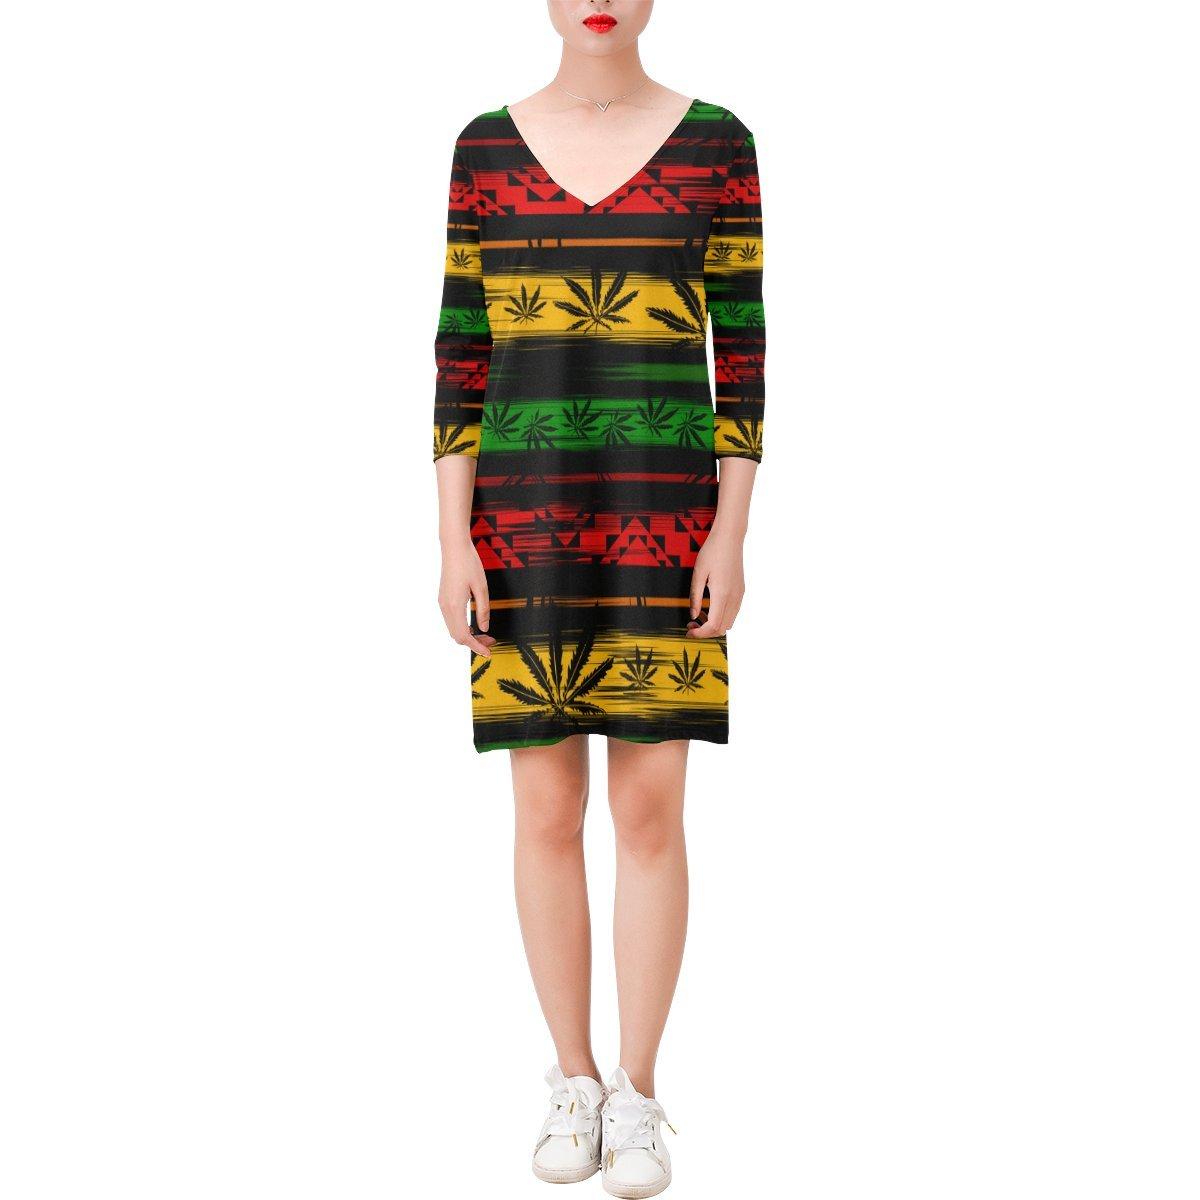 InterestPrint Women's Sexy Faux Wrap Dress Unique Design Marijuana Cannabis Deep V Three-Quarter Sleeve Dress